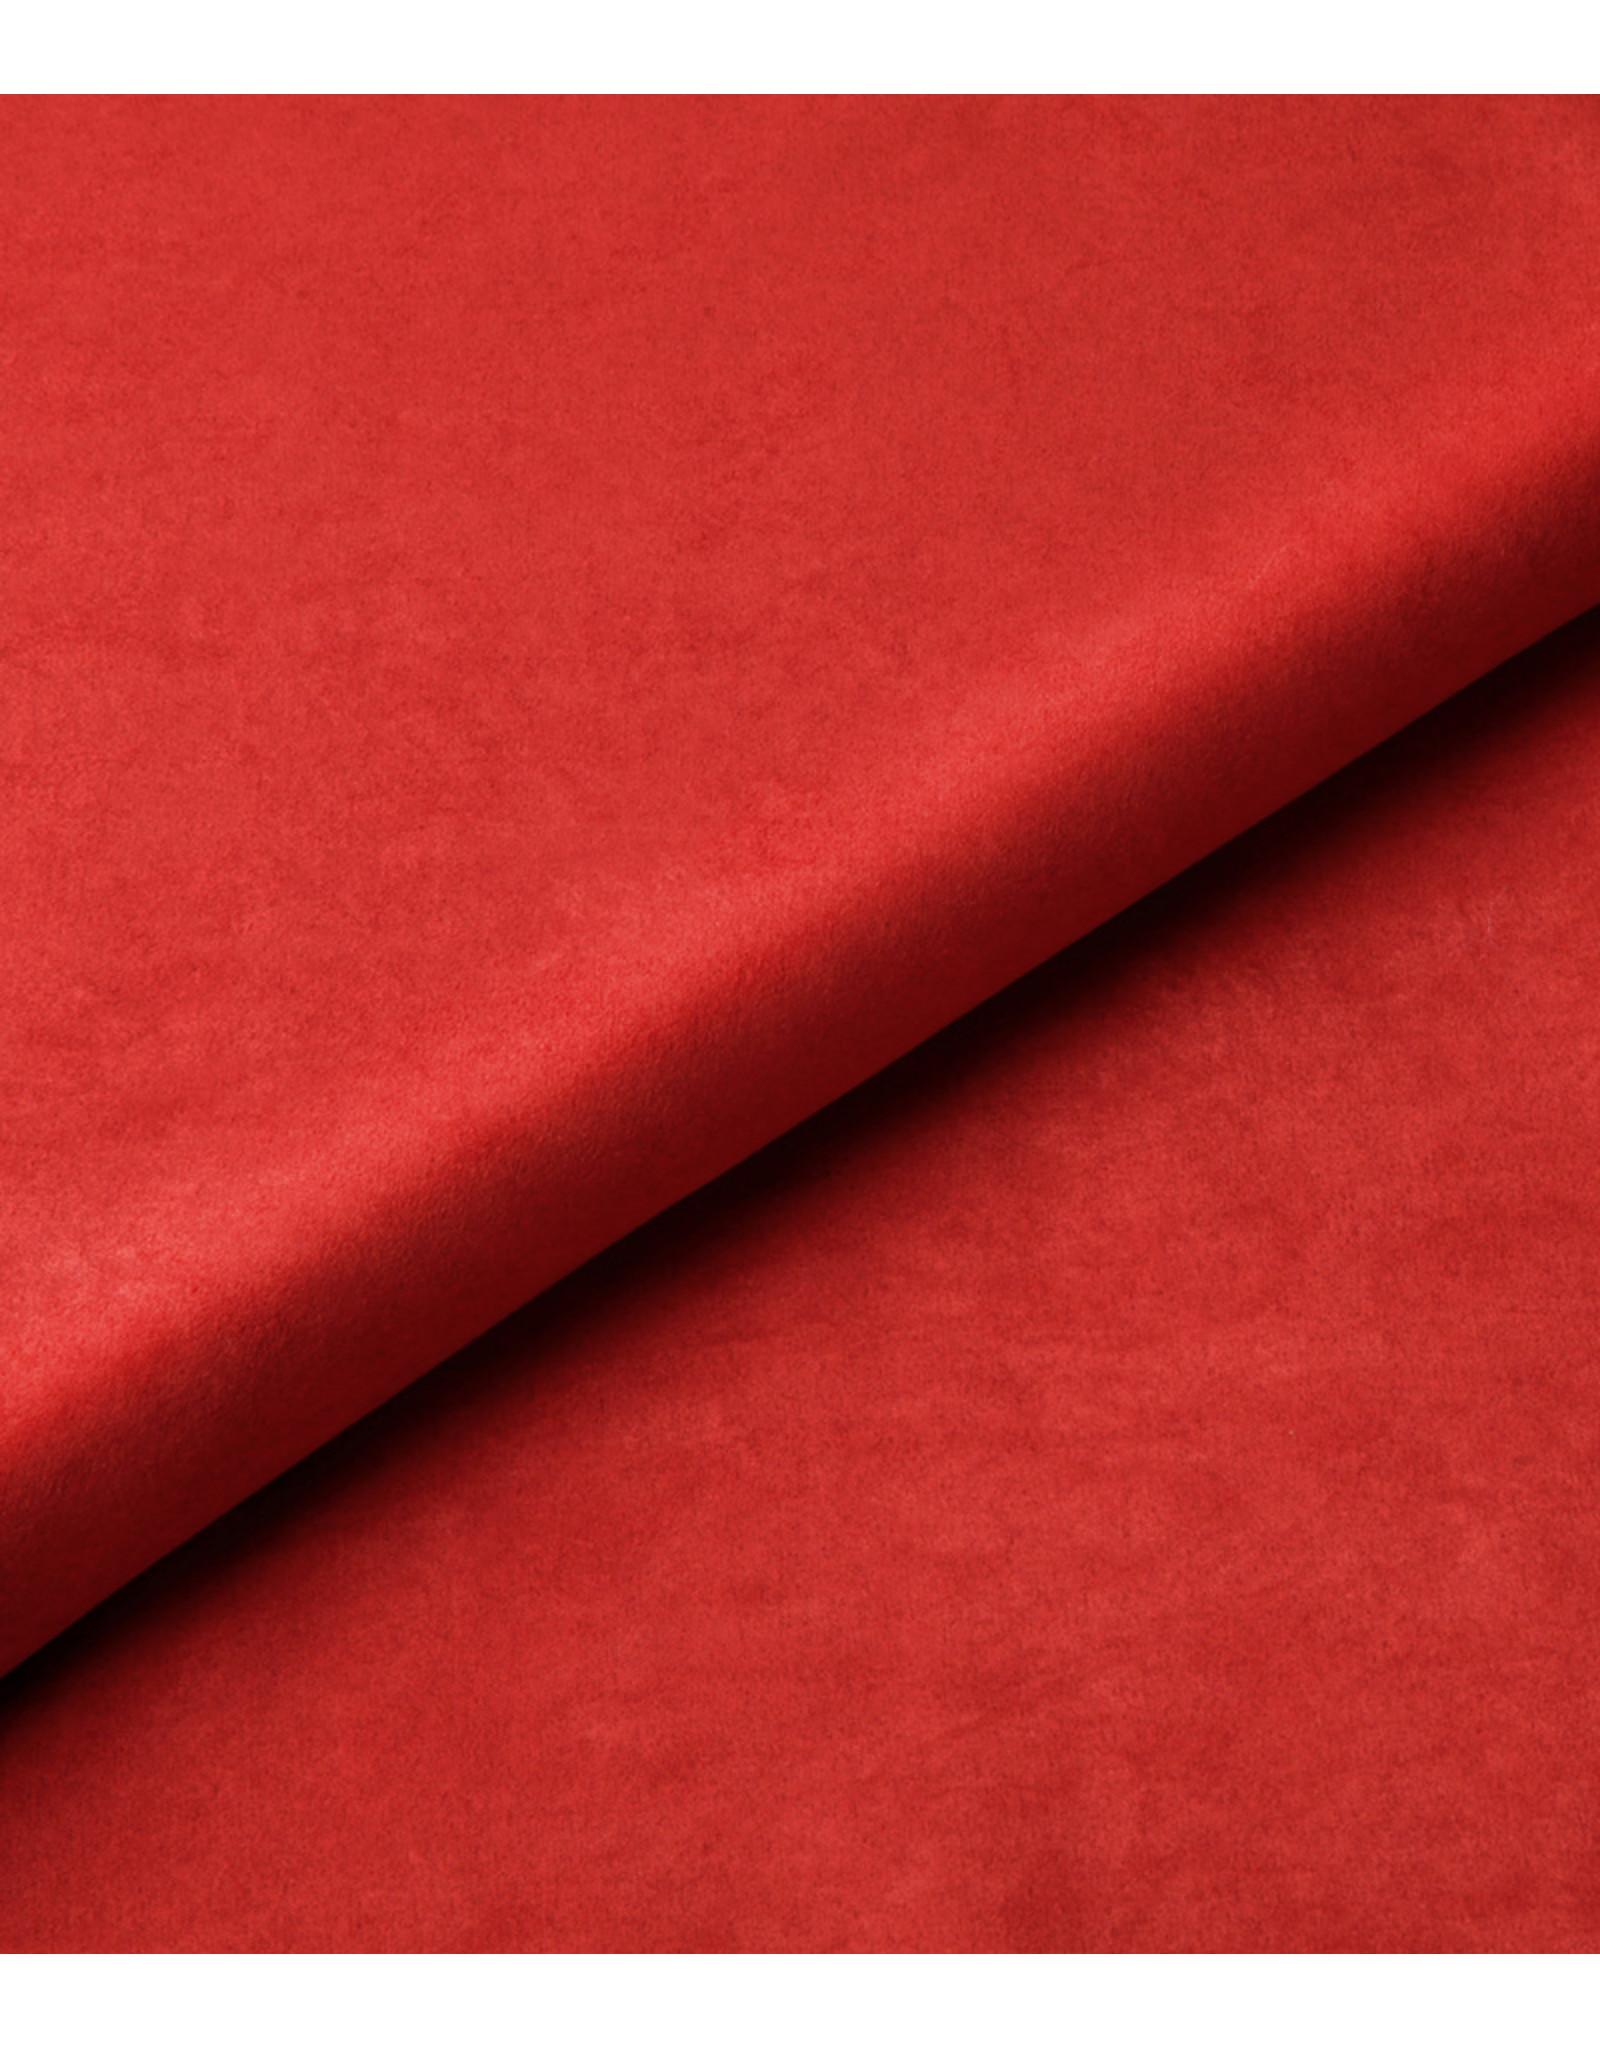 INVITALIS Ersatzbezug - Vitalymed Soft Bordoux